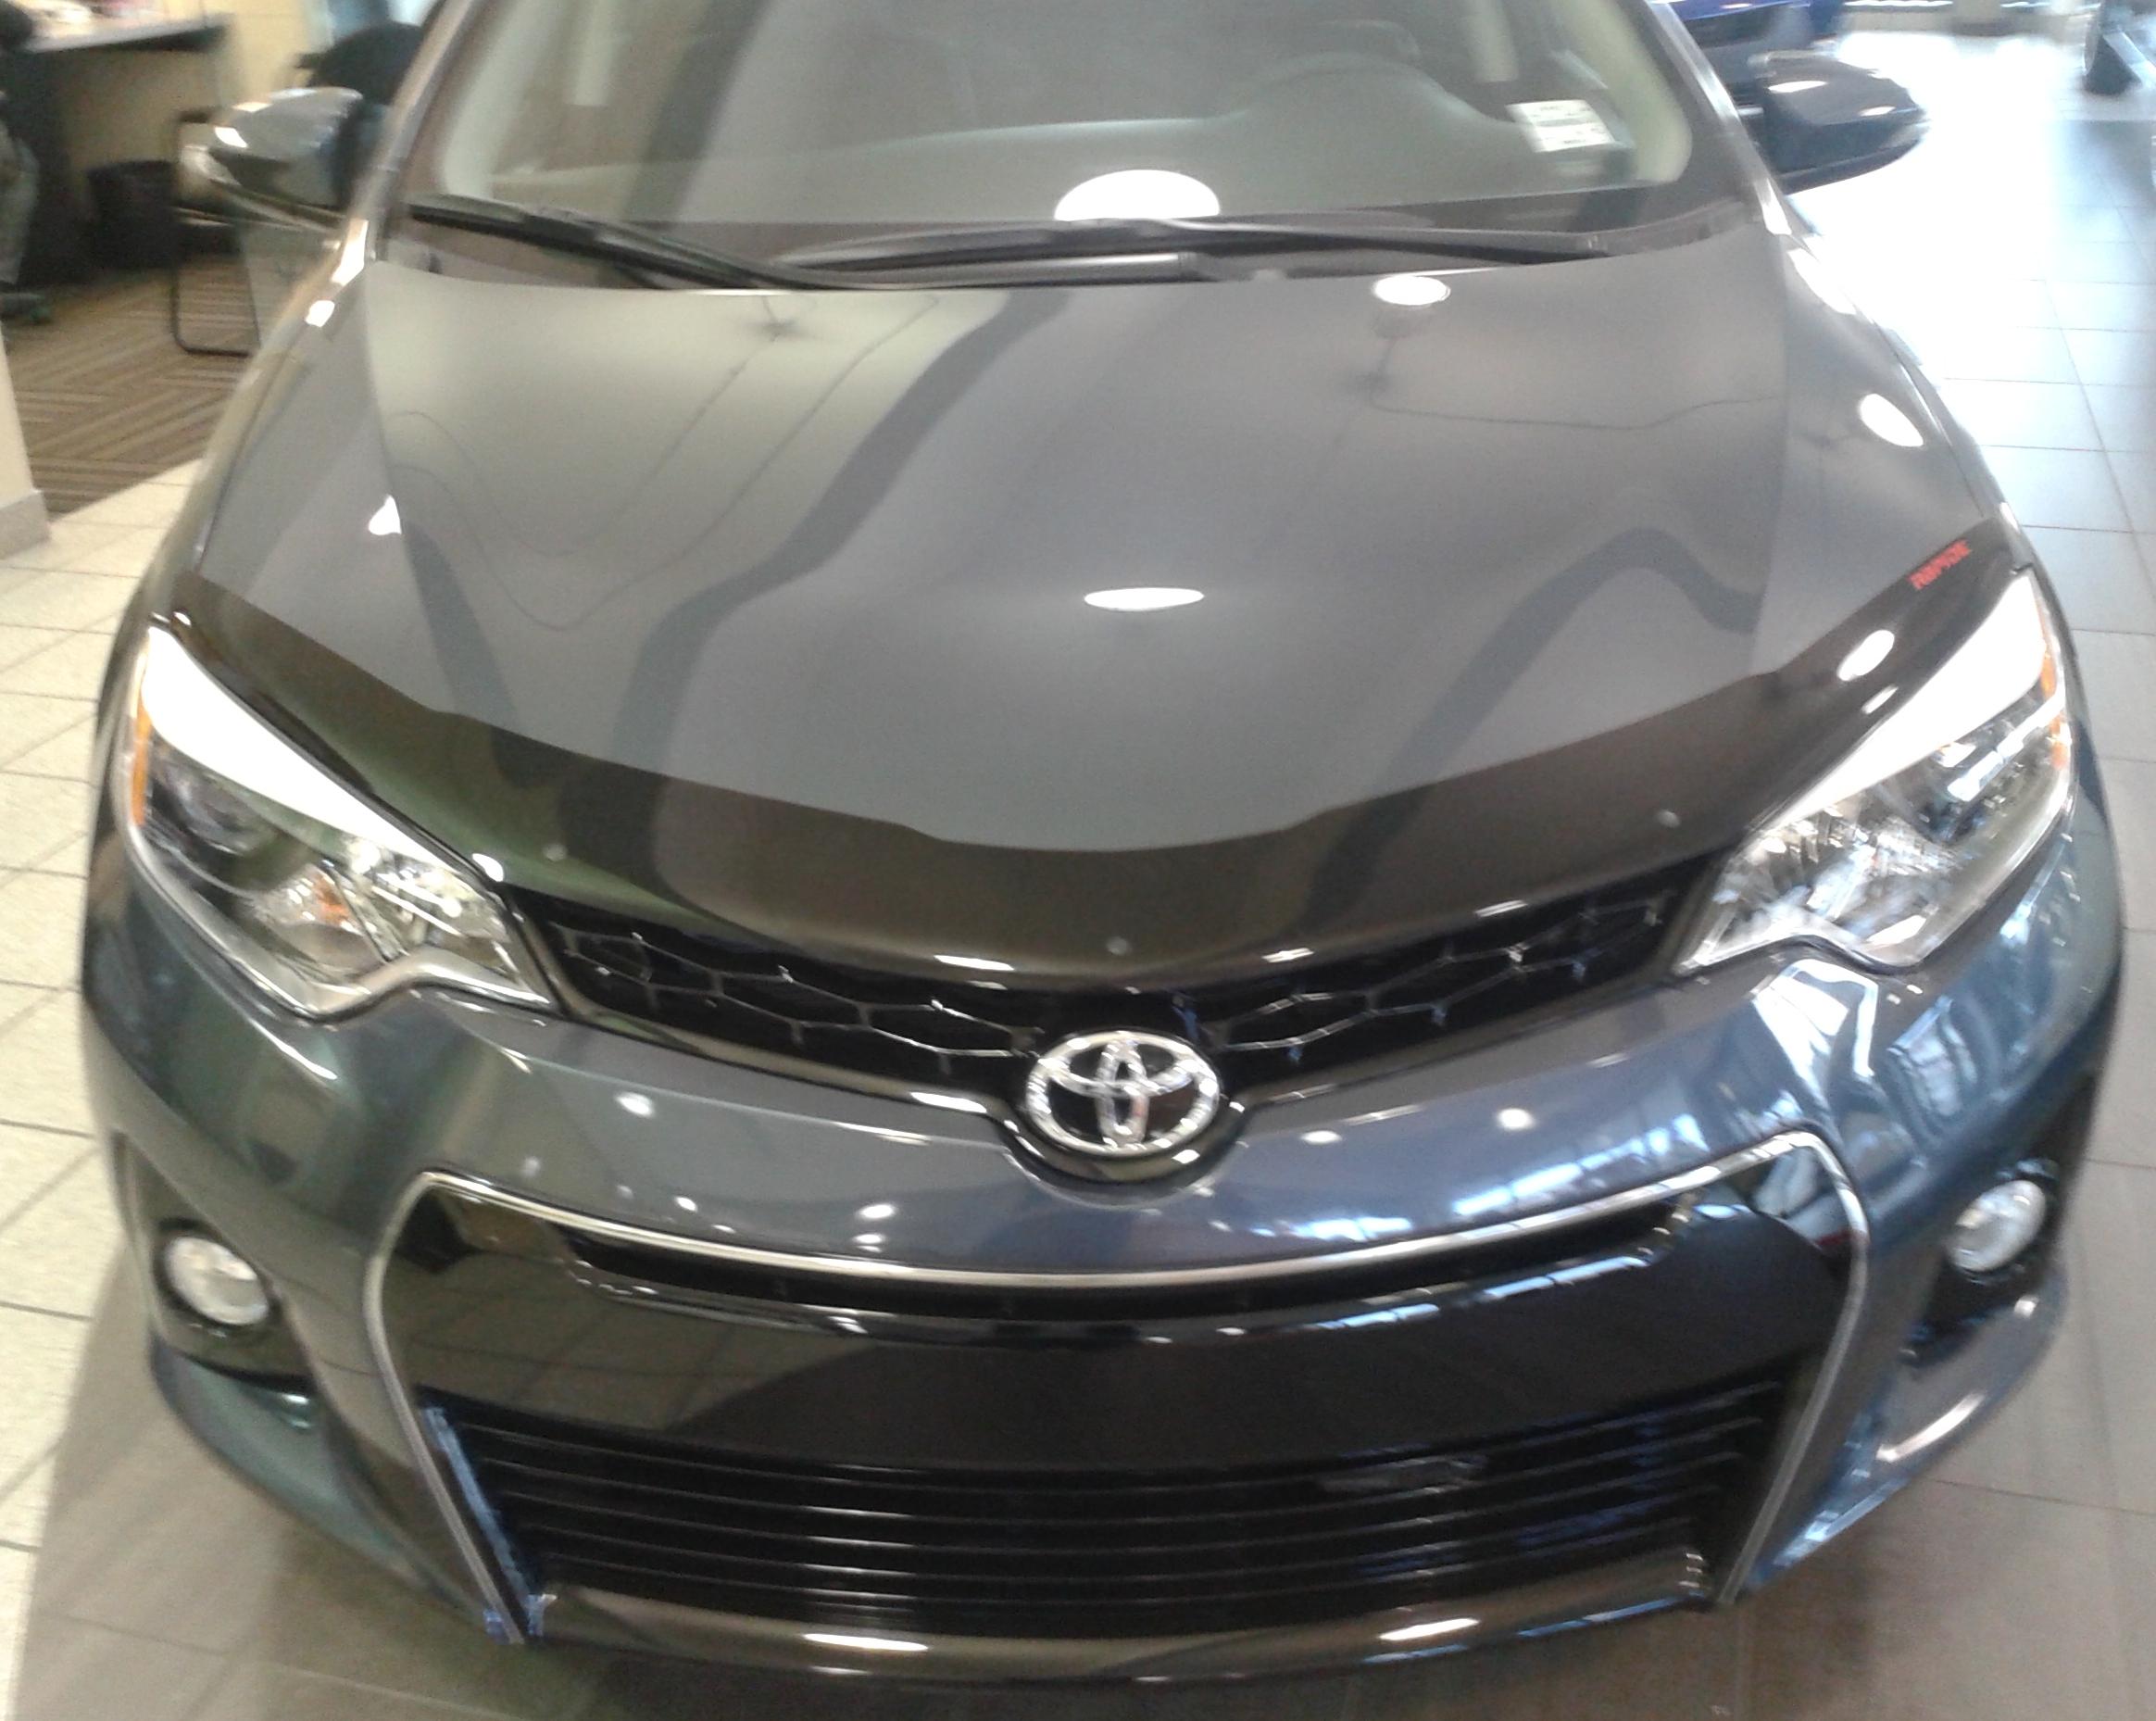 Toyota Corolla 2014 Up Formfit Hood Protectors